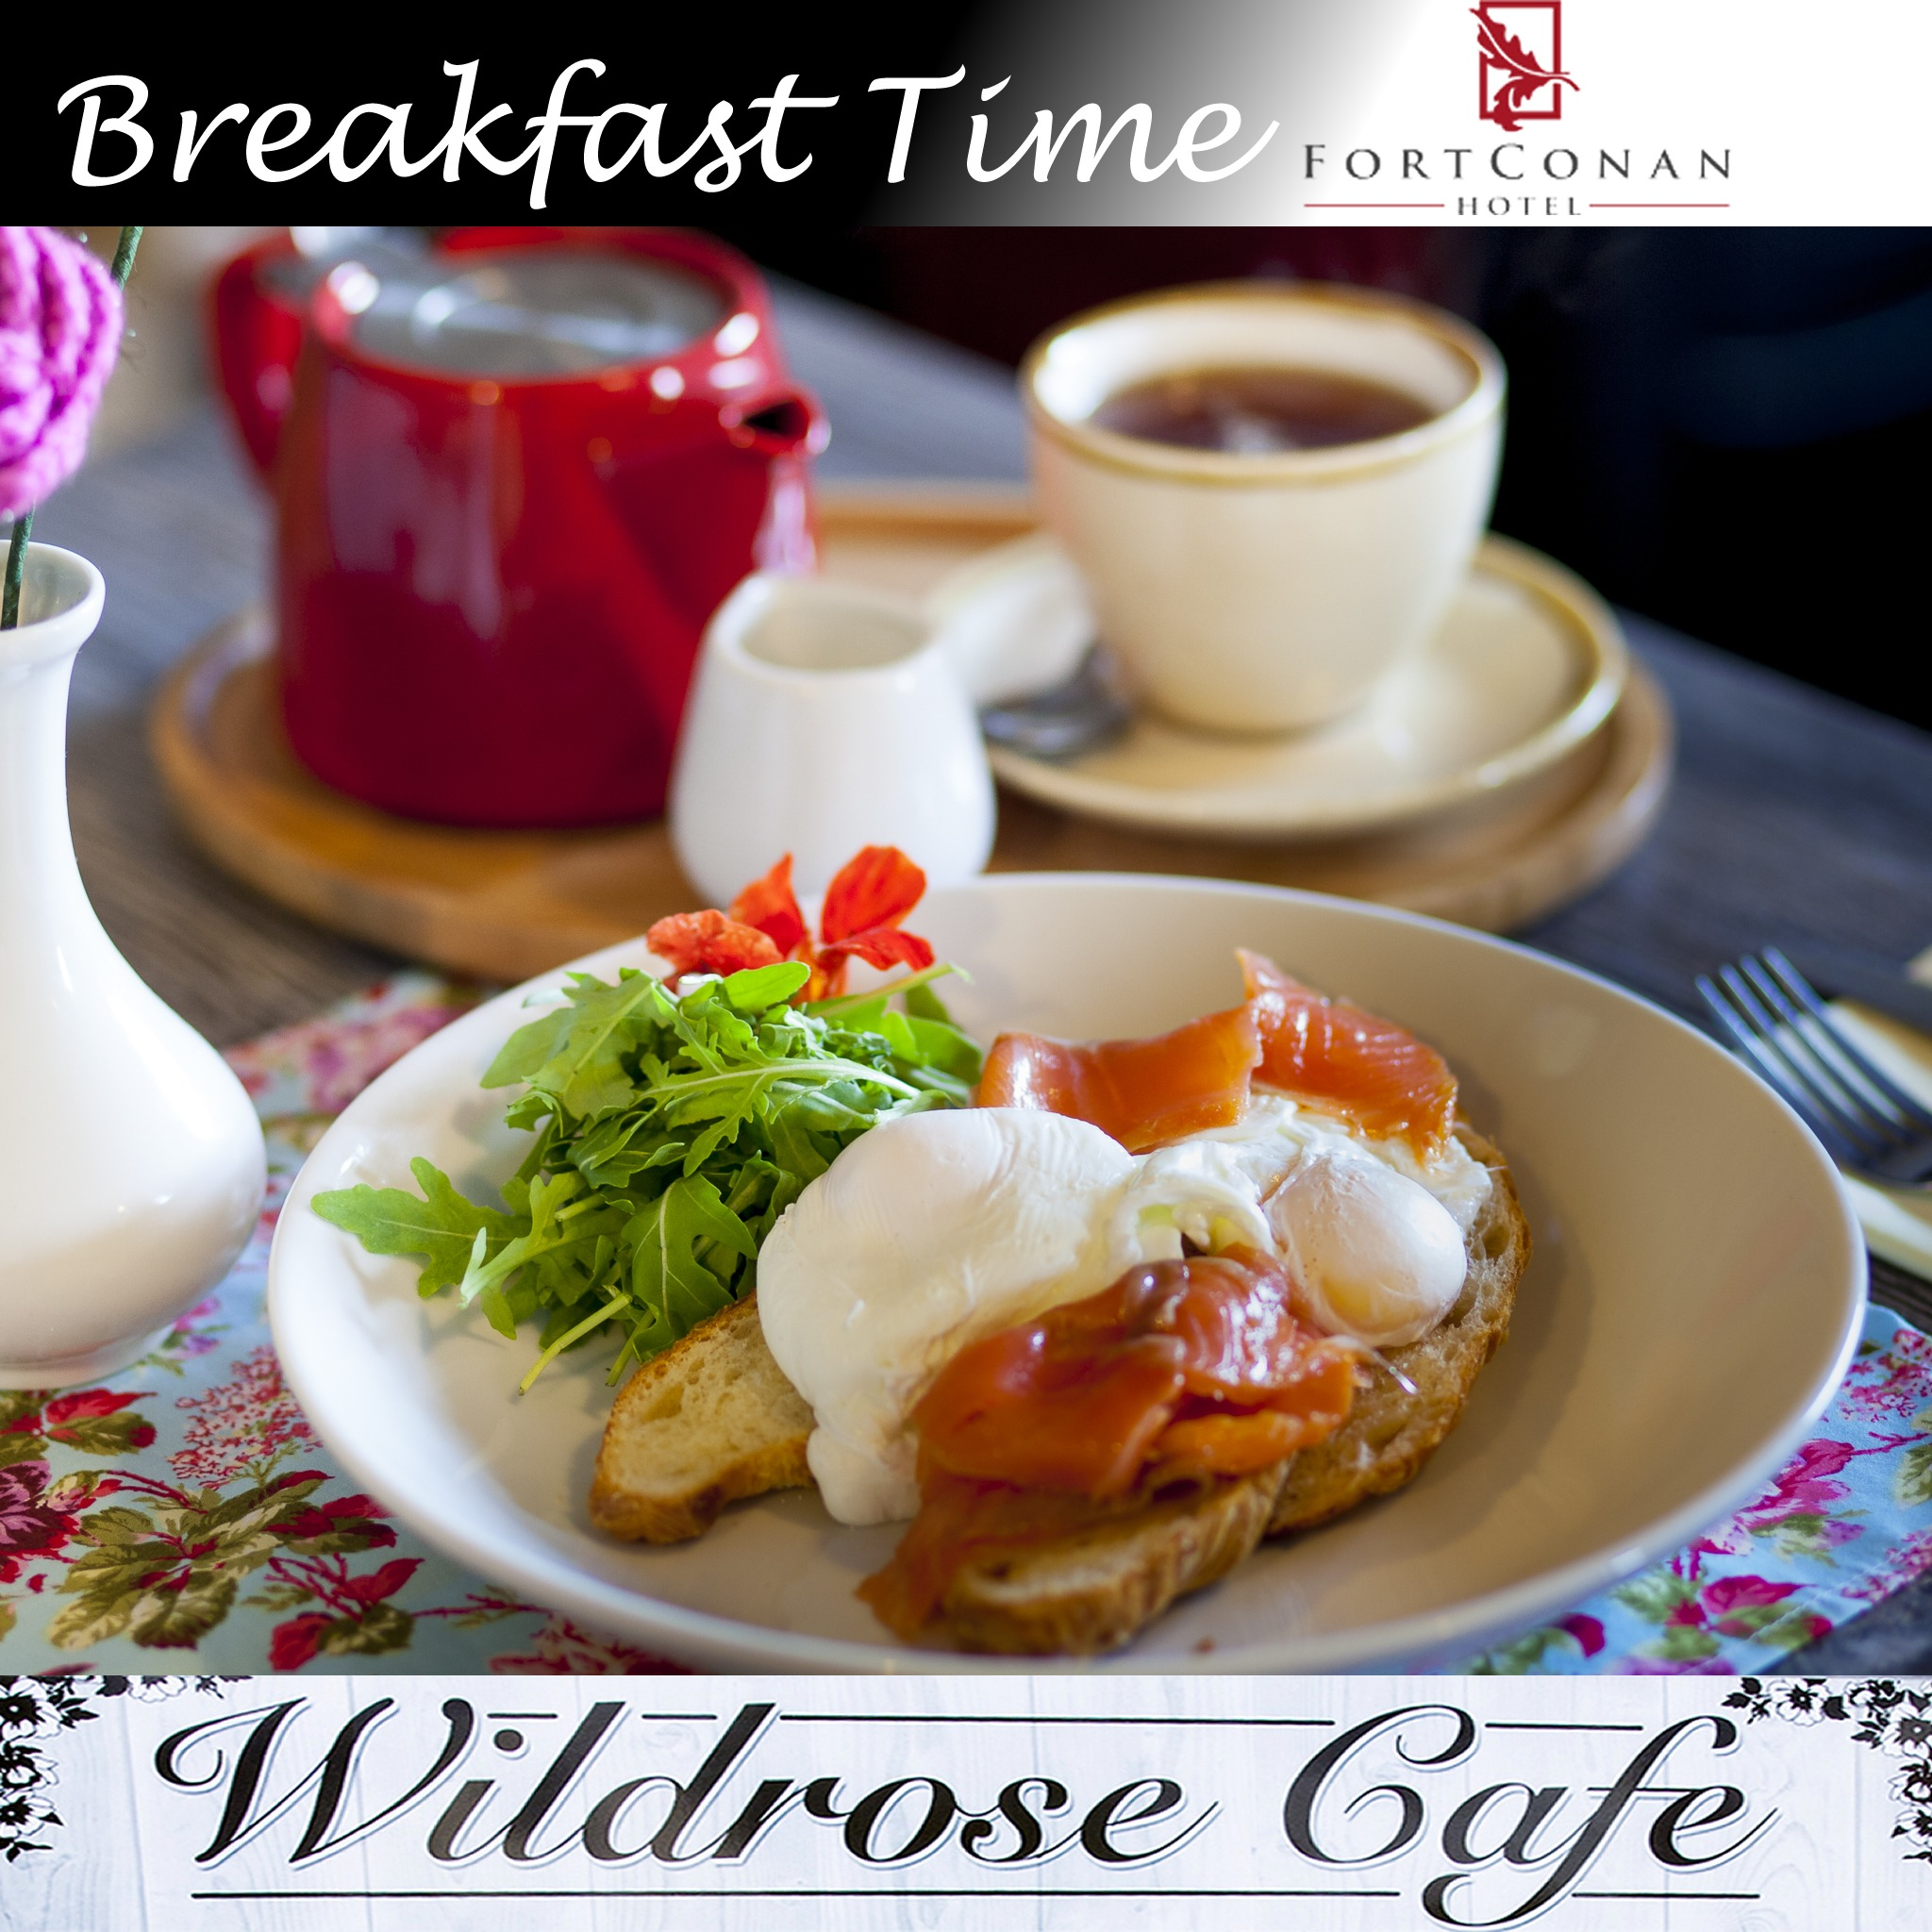 wild rose cafe breakfast